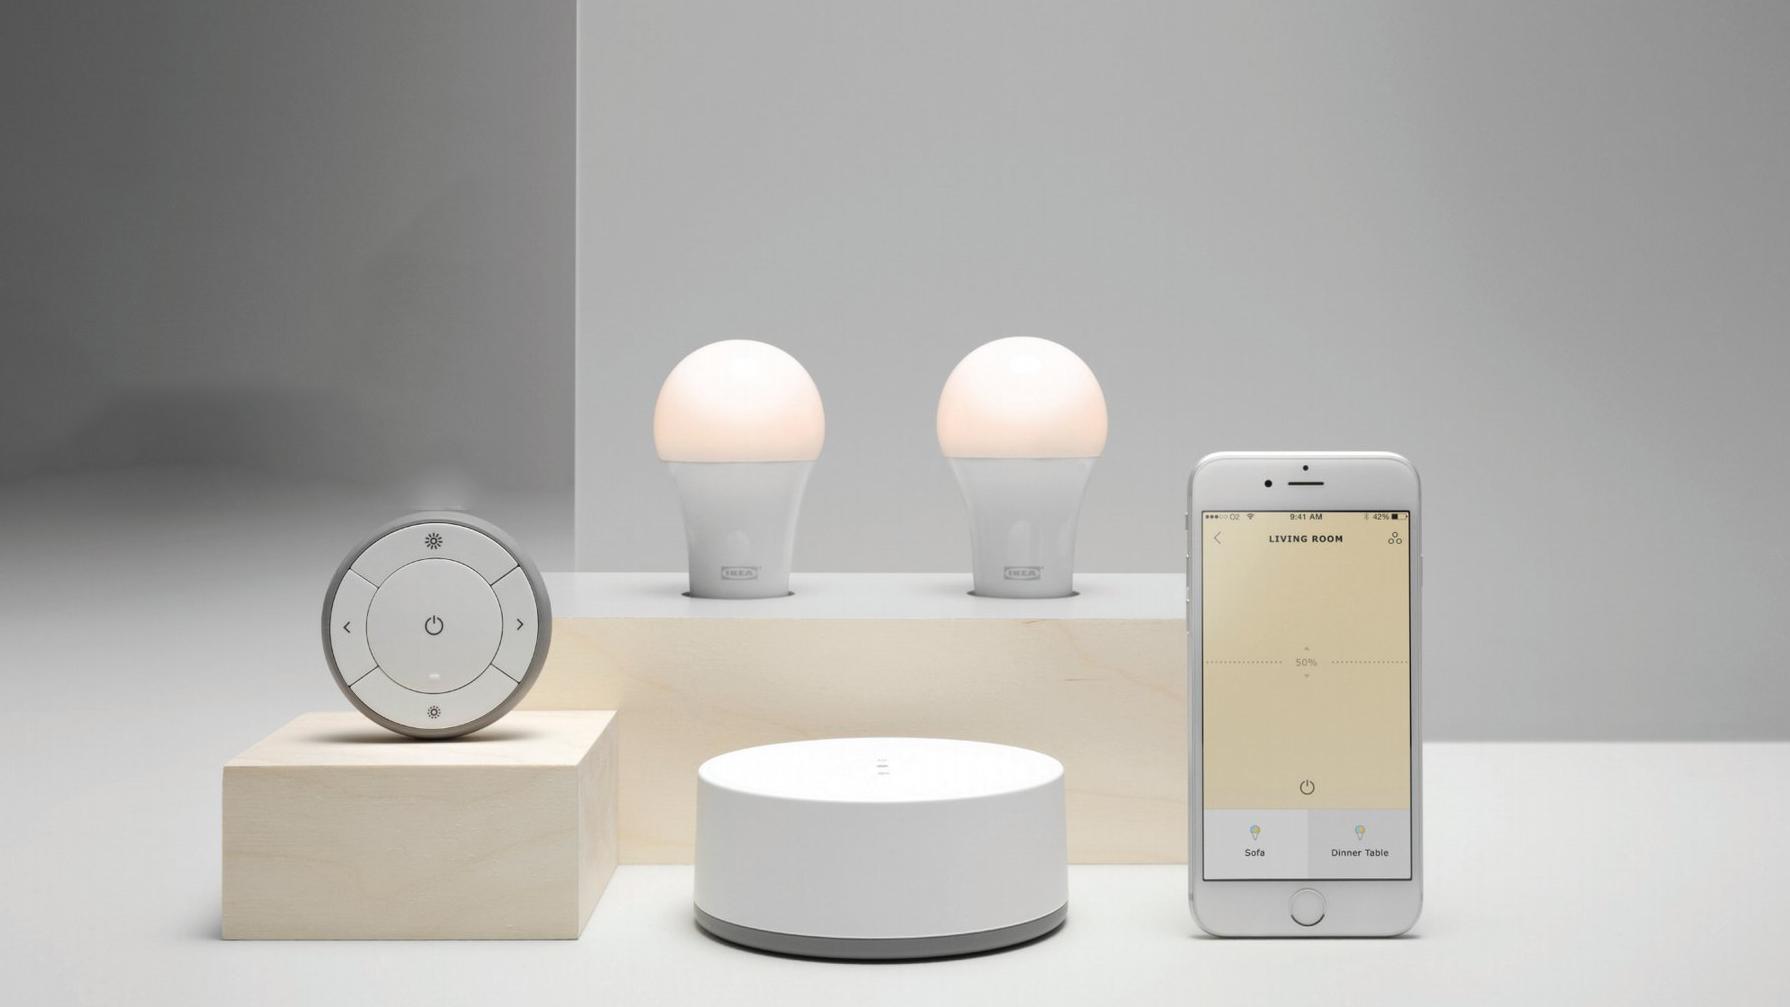 Ikea S Smart Lights Will Support Apple Homekit Google